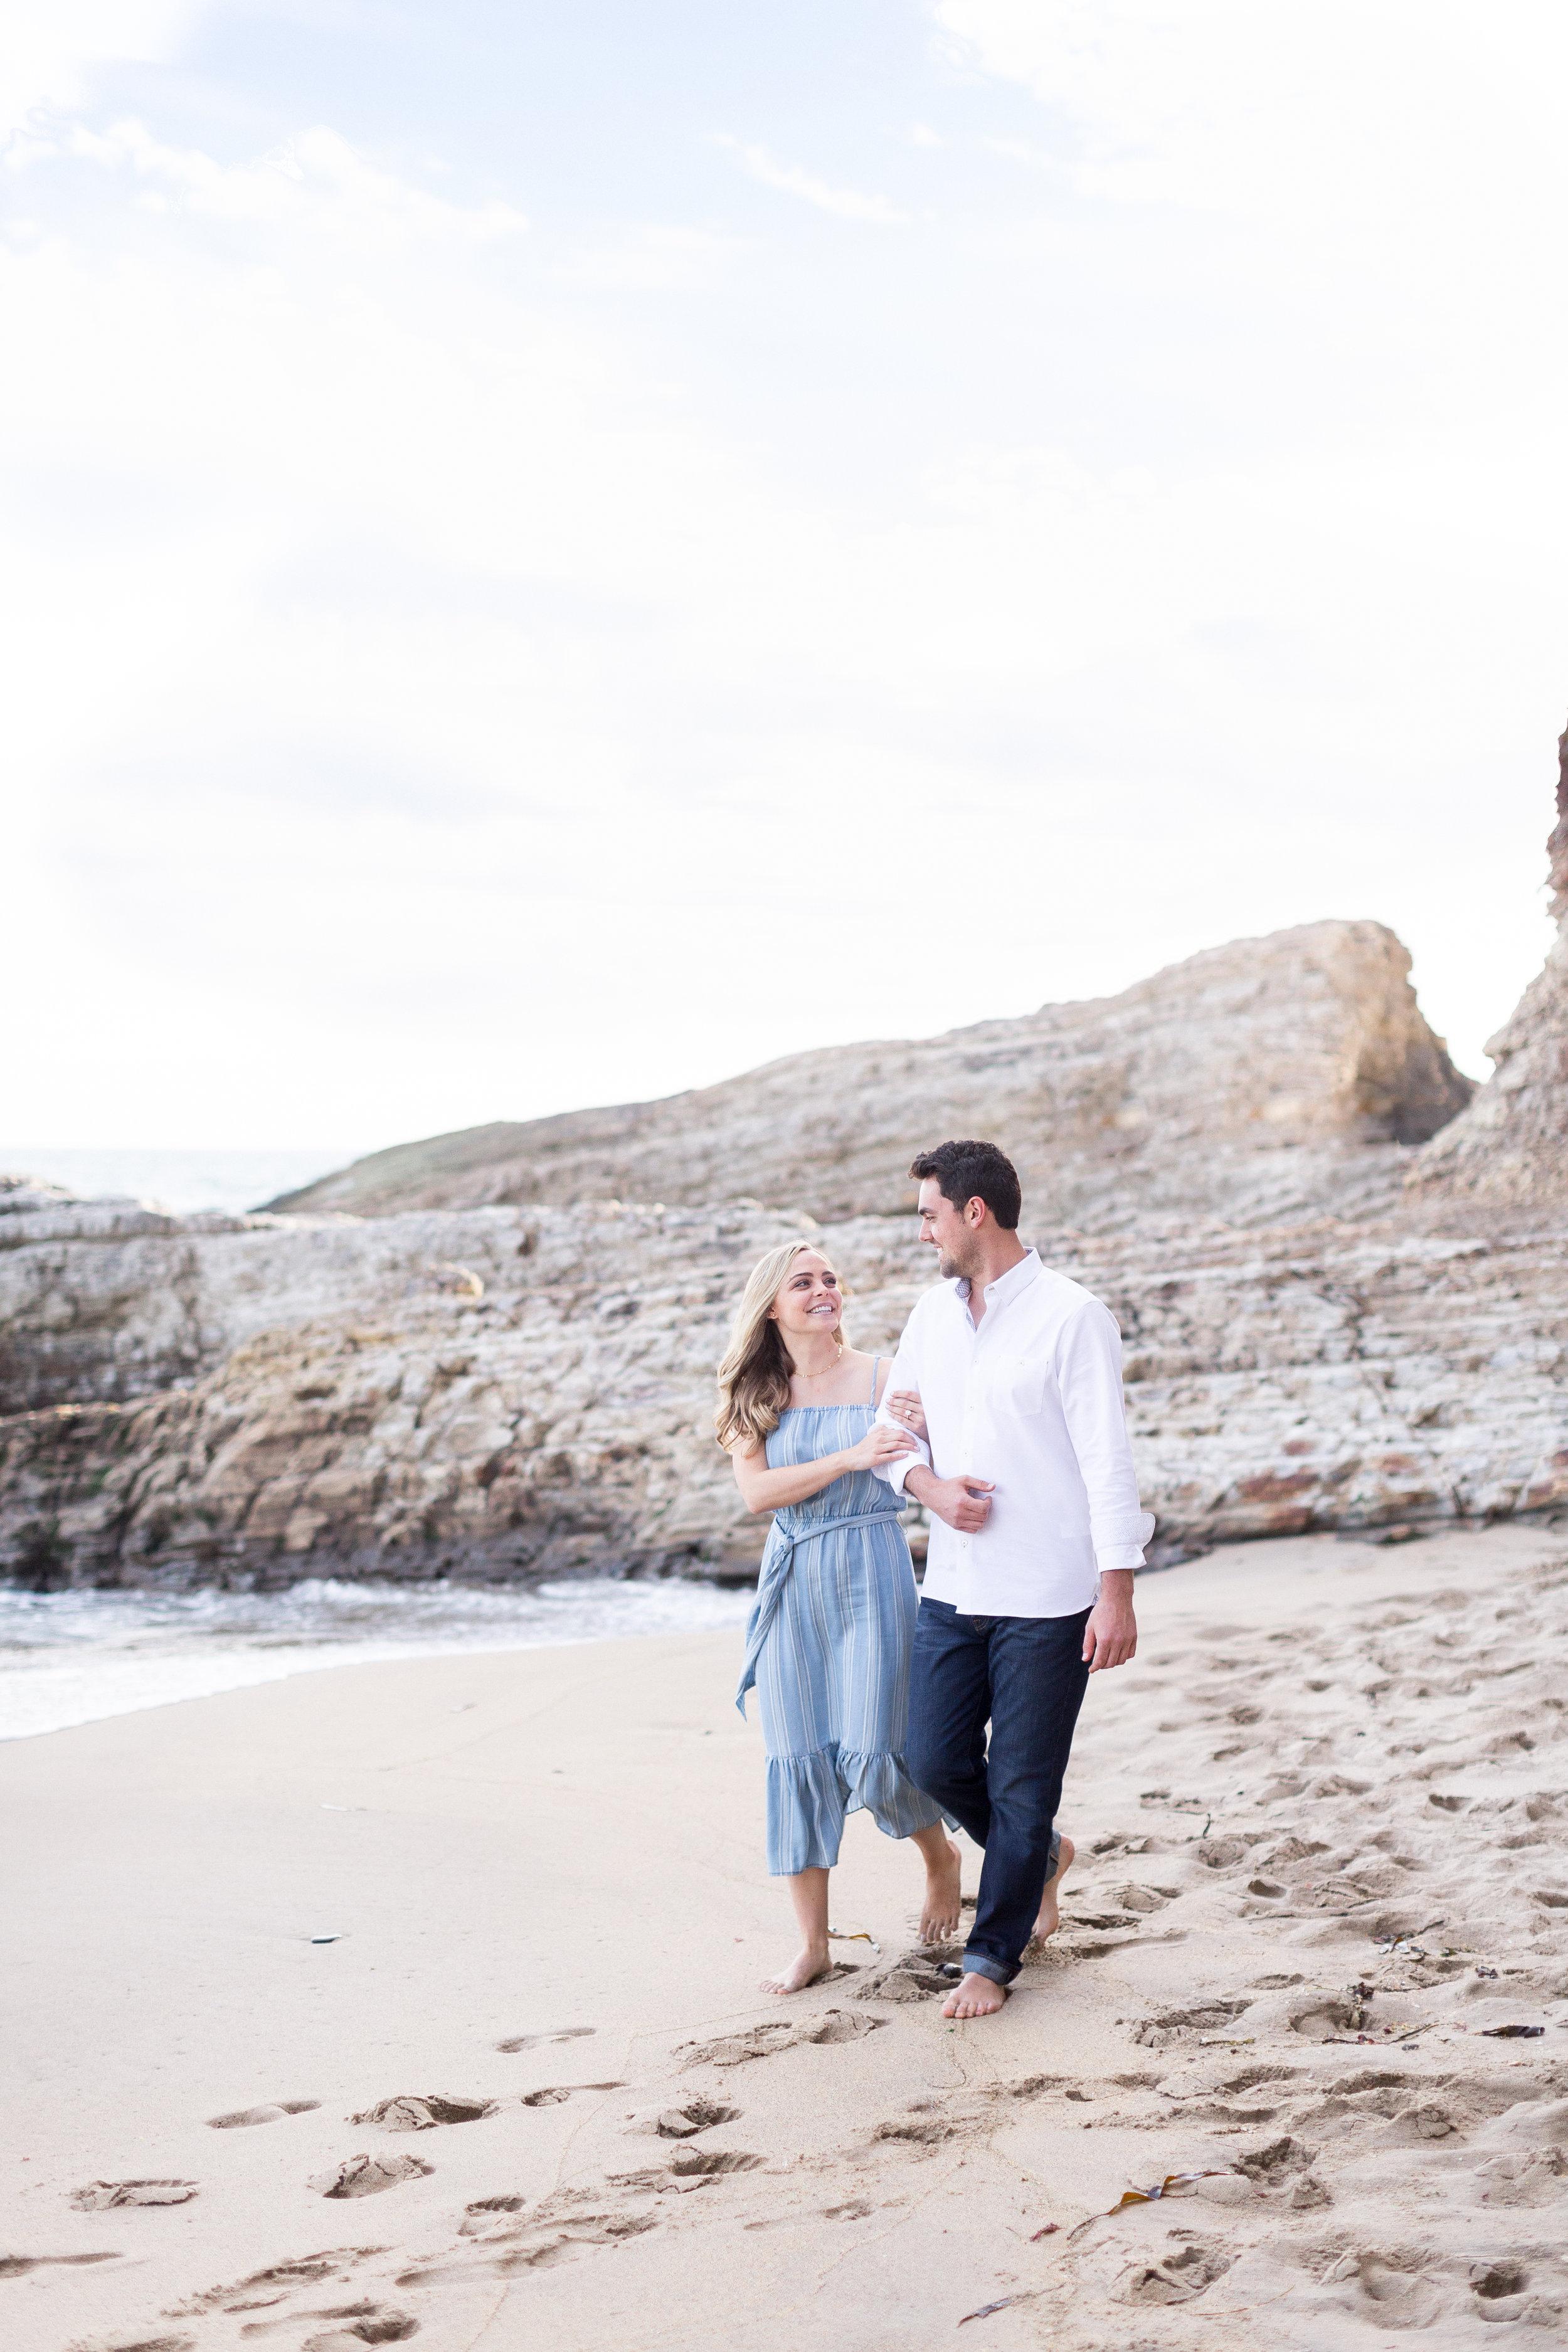 panther-beach-santa-cruz-engagement-session-photographer-32.jpg